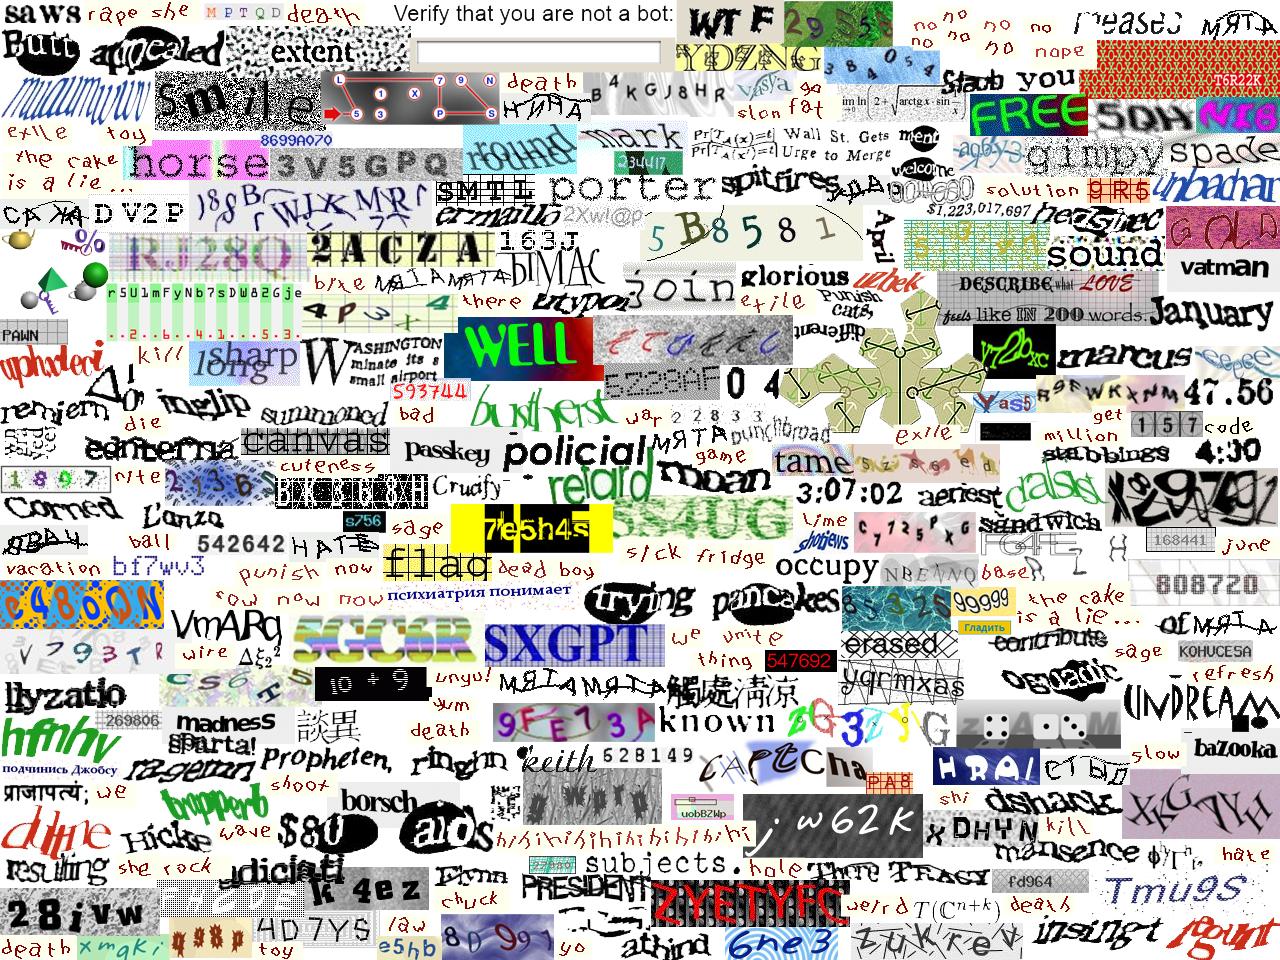 Captcha Wallpaper by JuneII